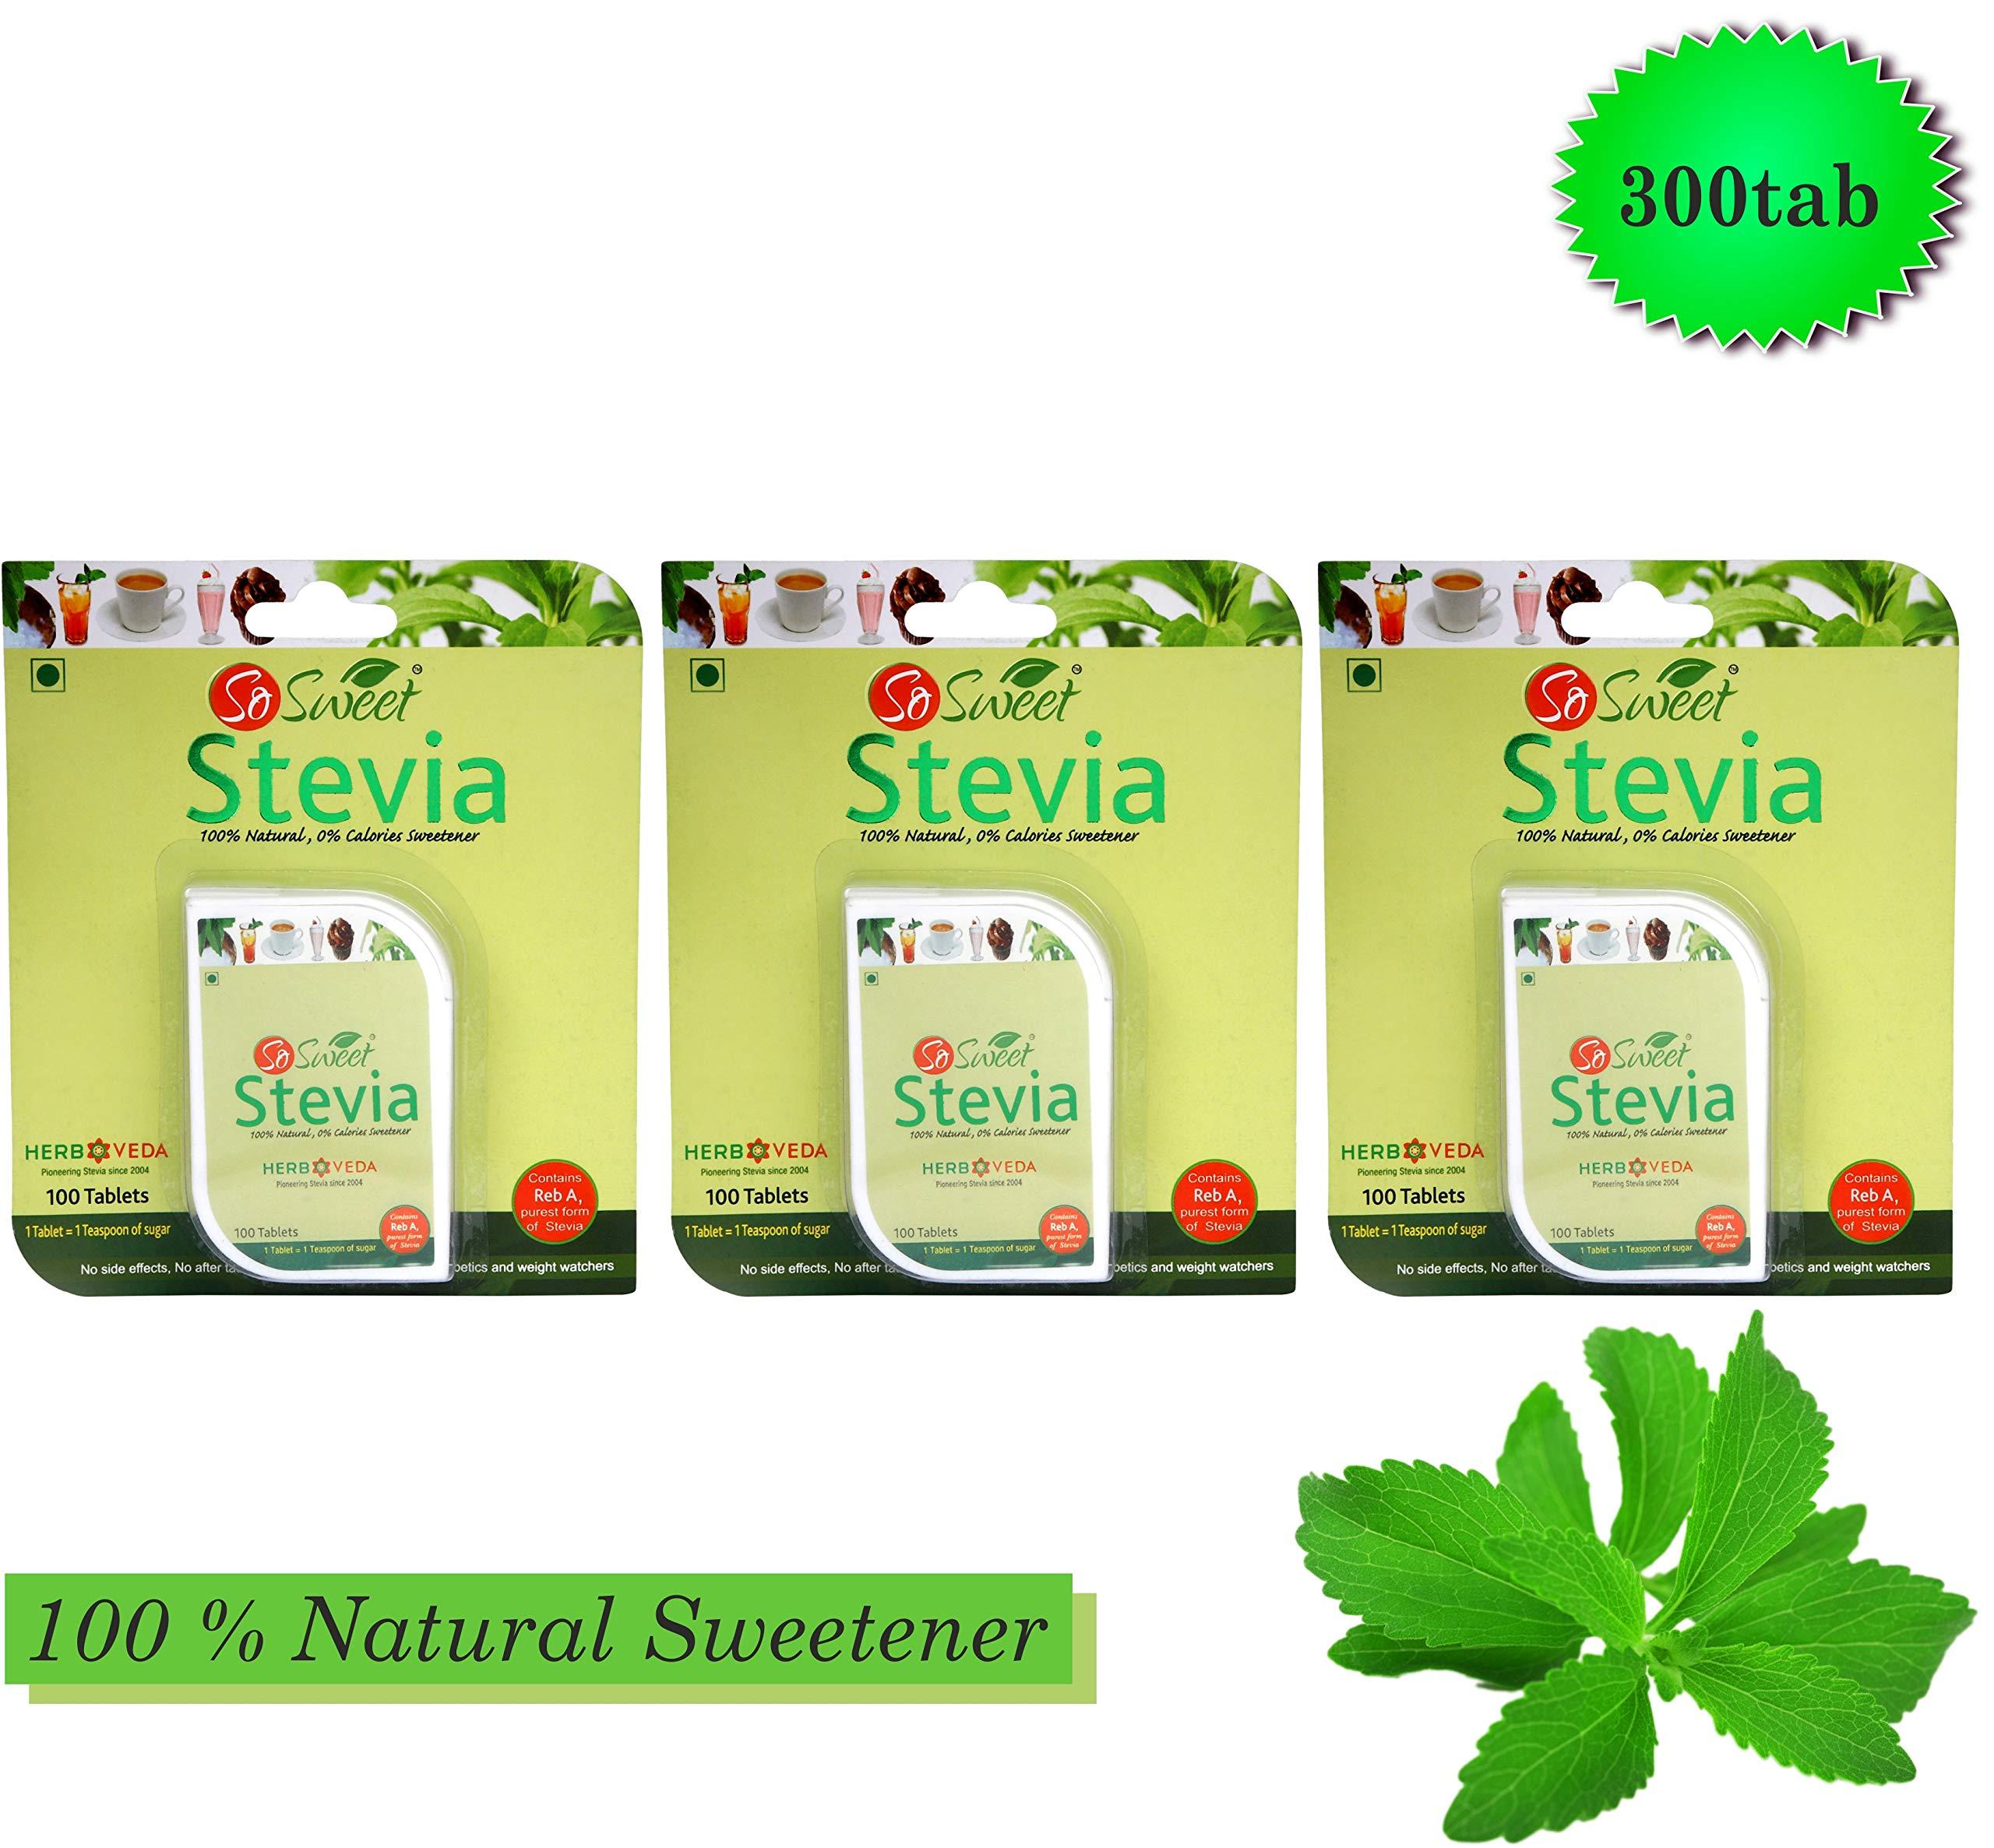 So Sweet 300 Stevia Tablets